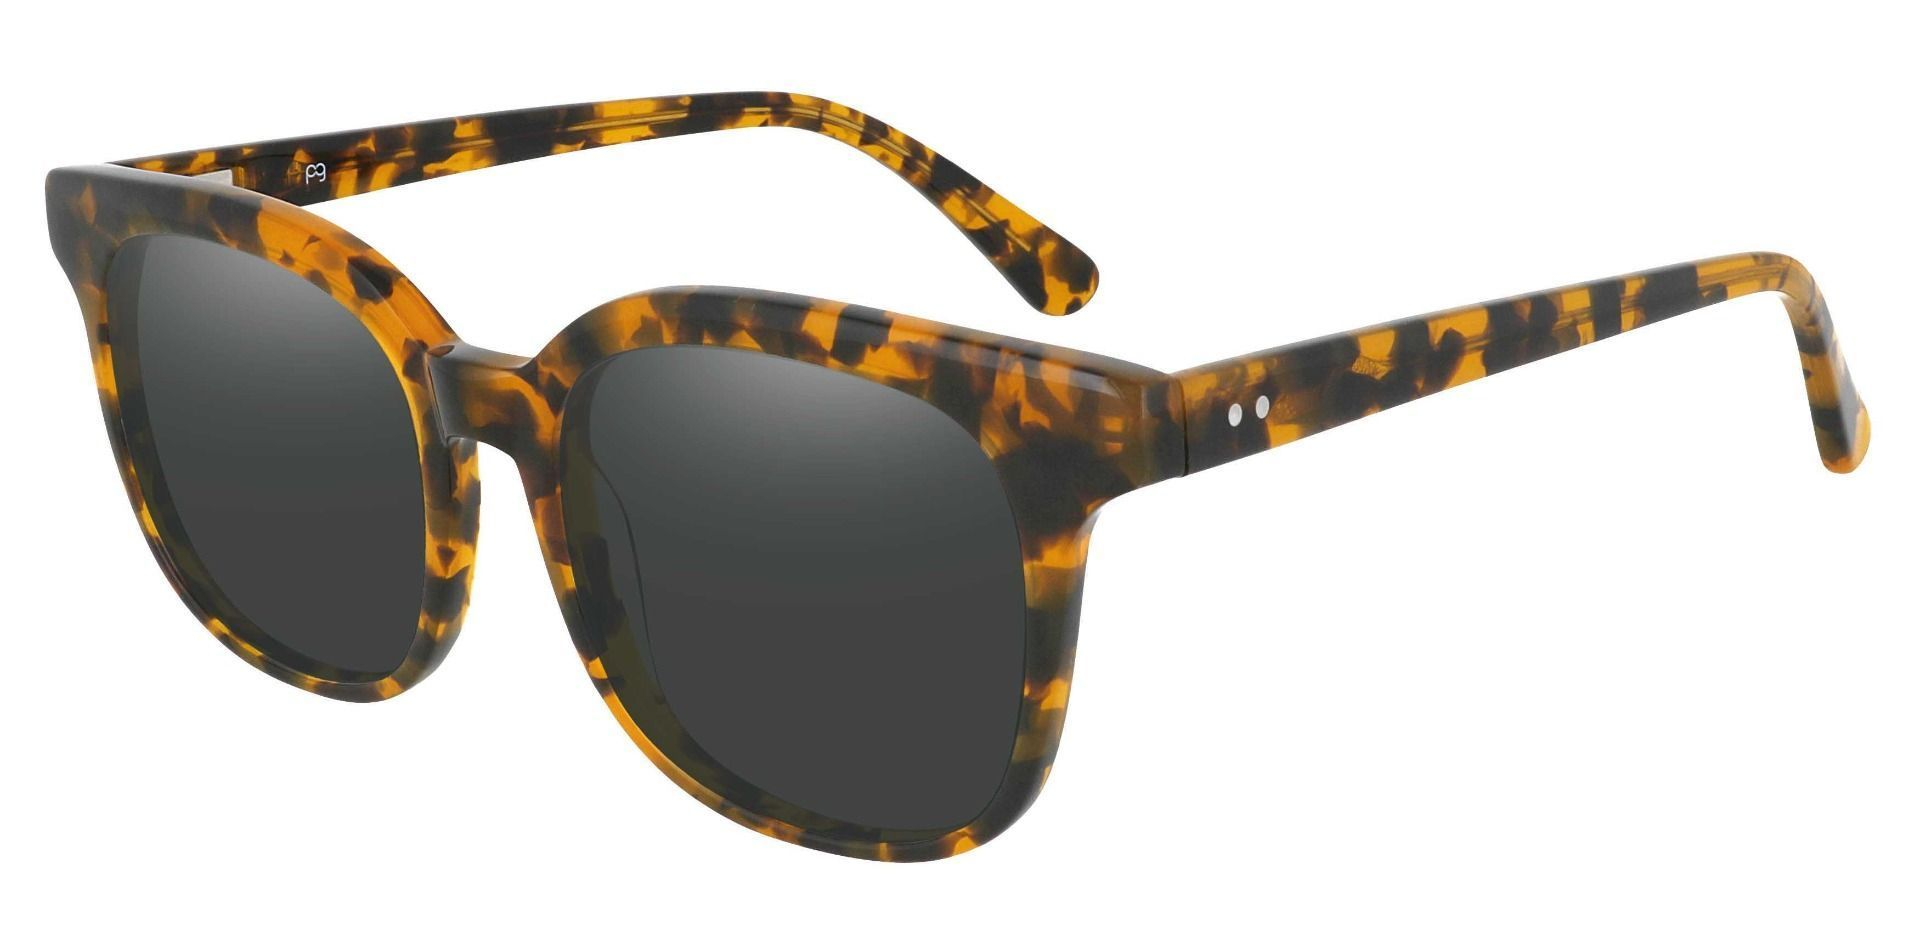 Tenor Square Prescription Sunglasses - Tortoise Frame With Gray Lenses